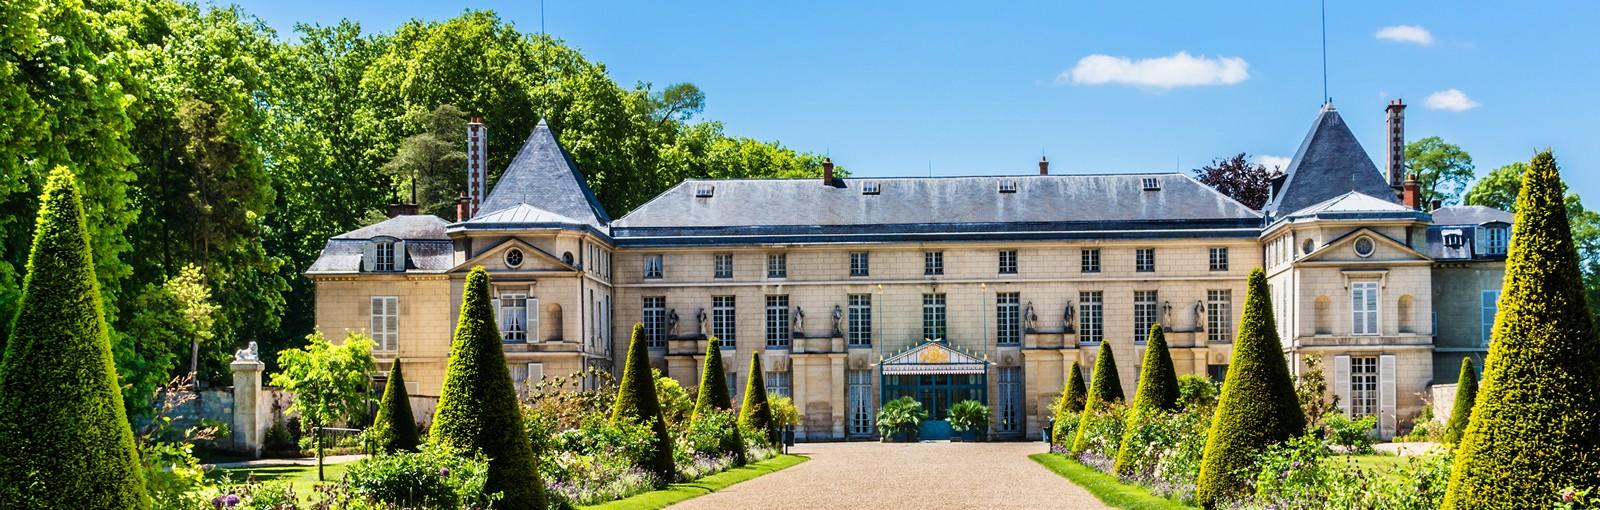 Tours 马尔梅松城堡Malmaison - 半日游 - 从巴黎出发的一日游